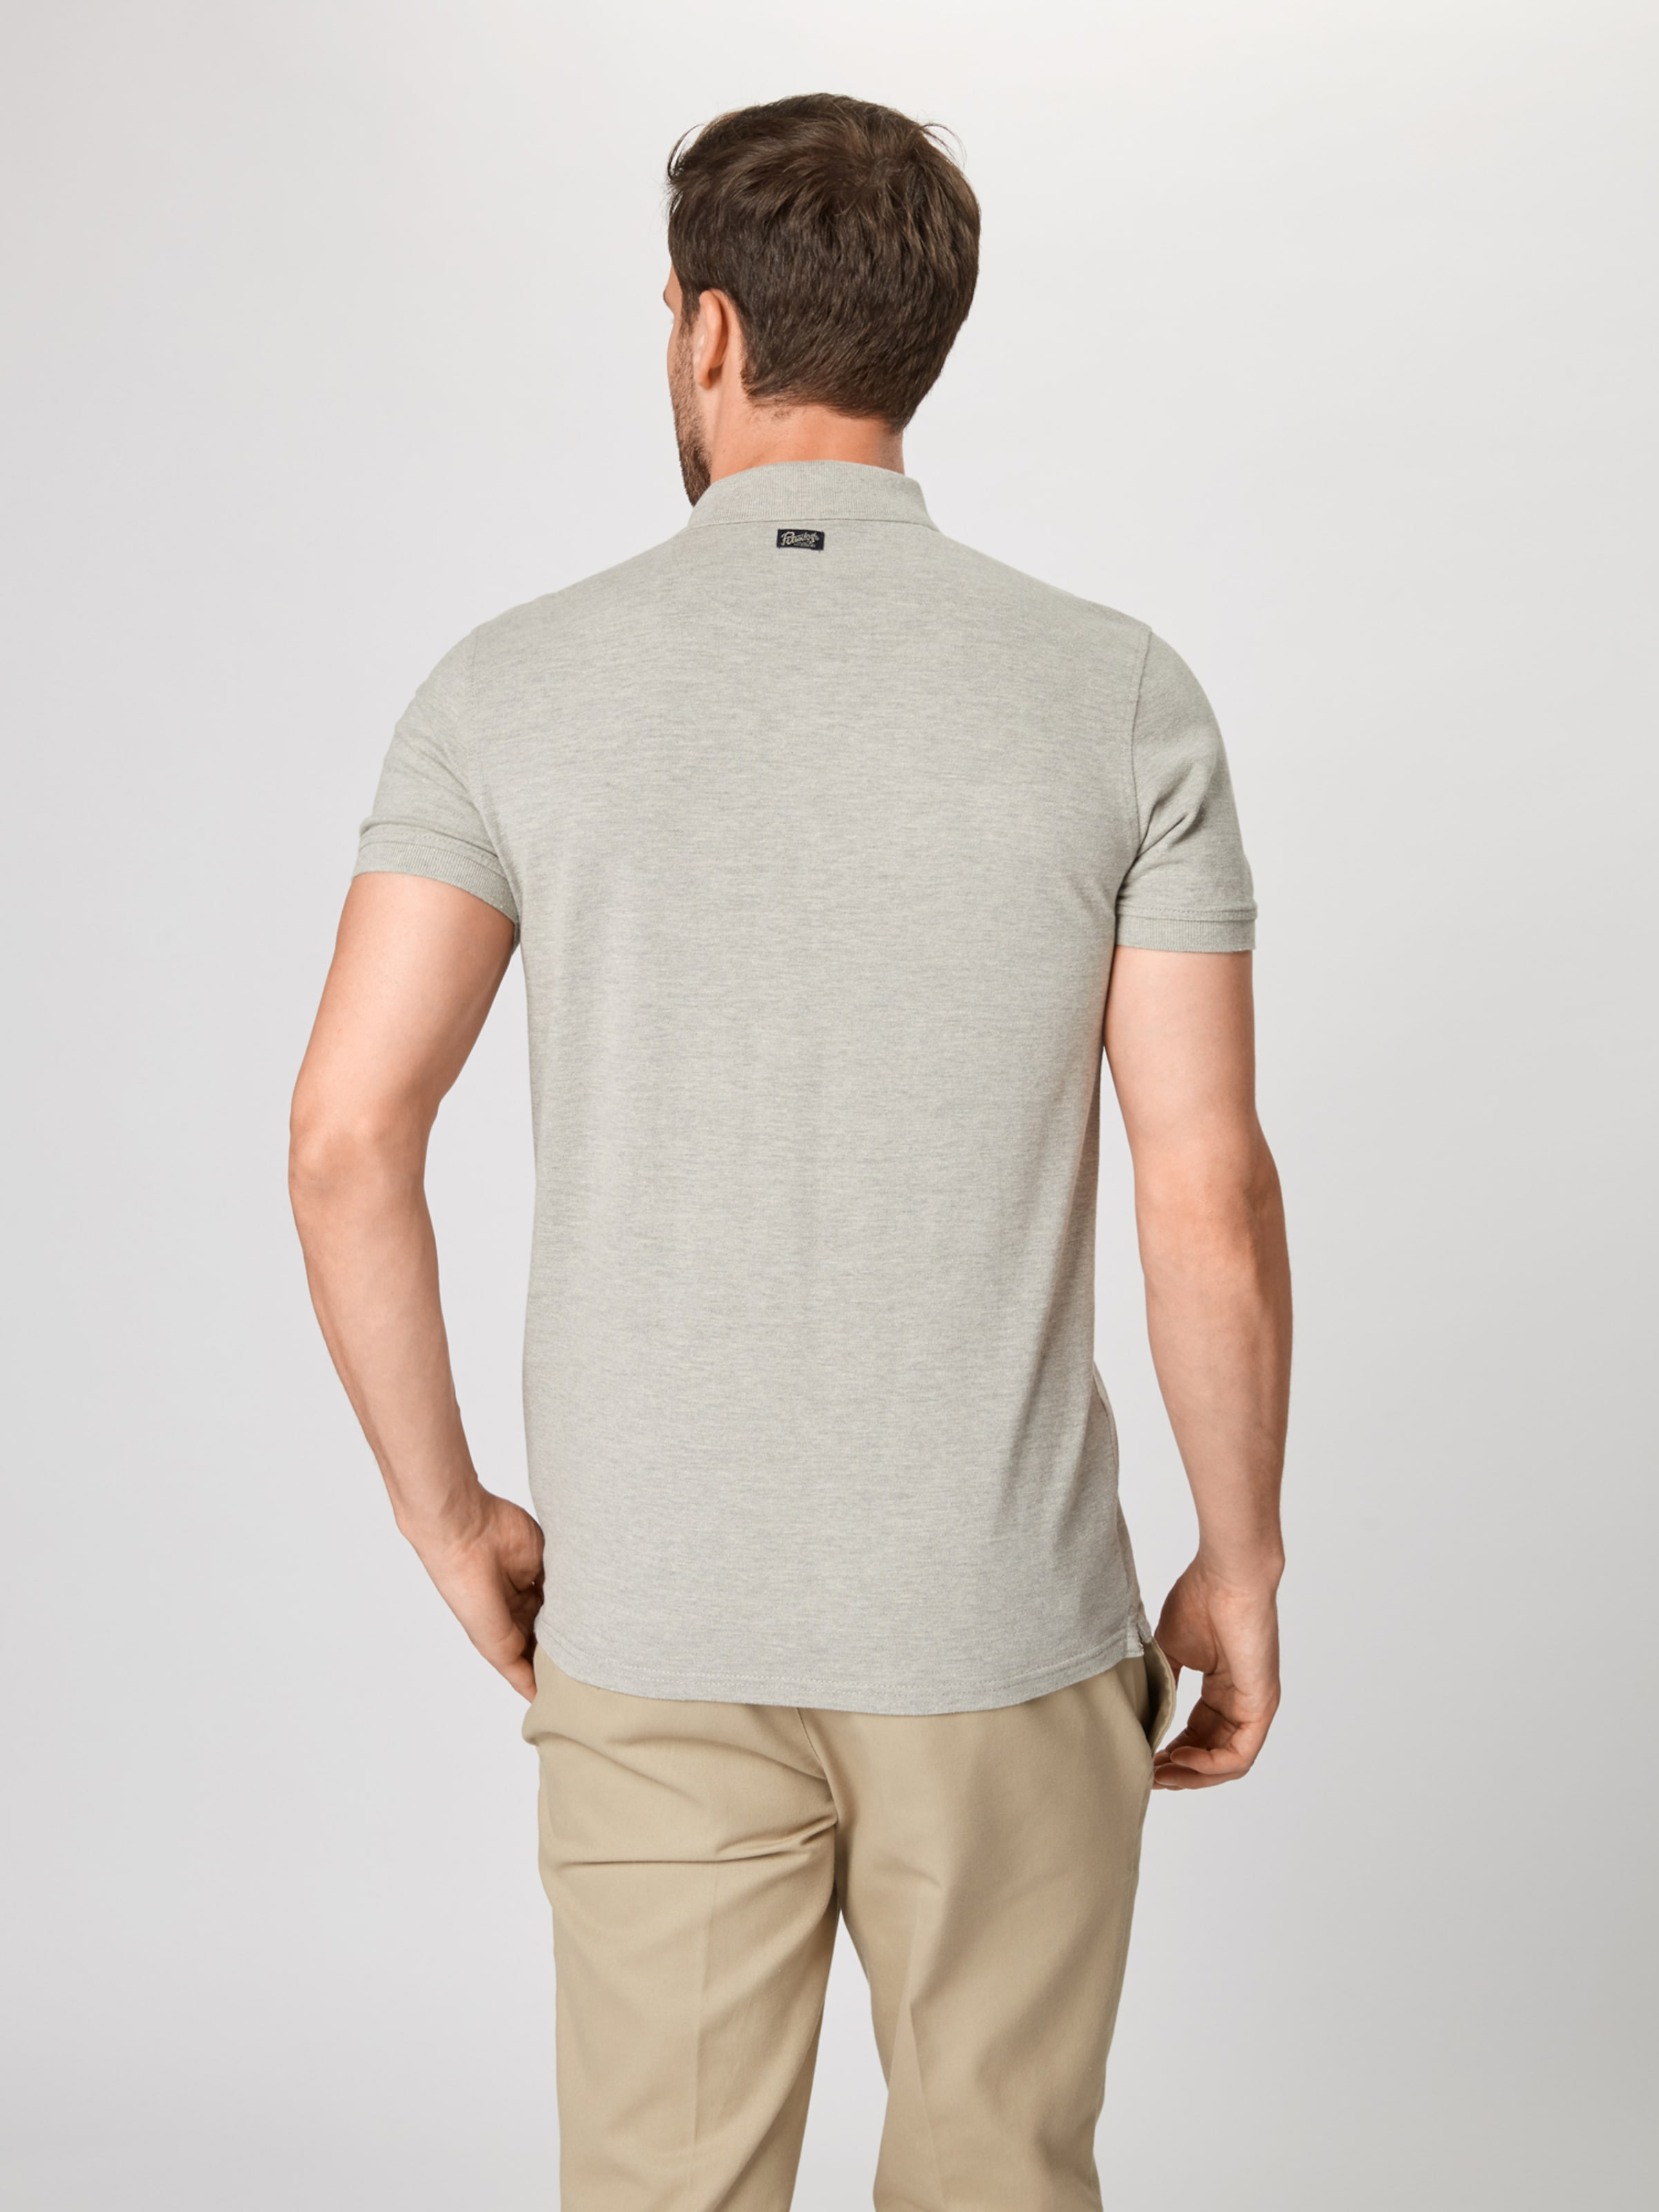 T Industries Gris Clair shirt En Petrol LzMVpSGUjq